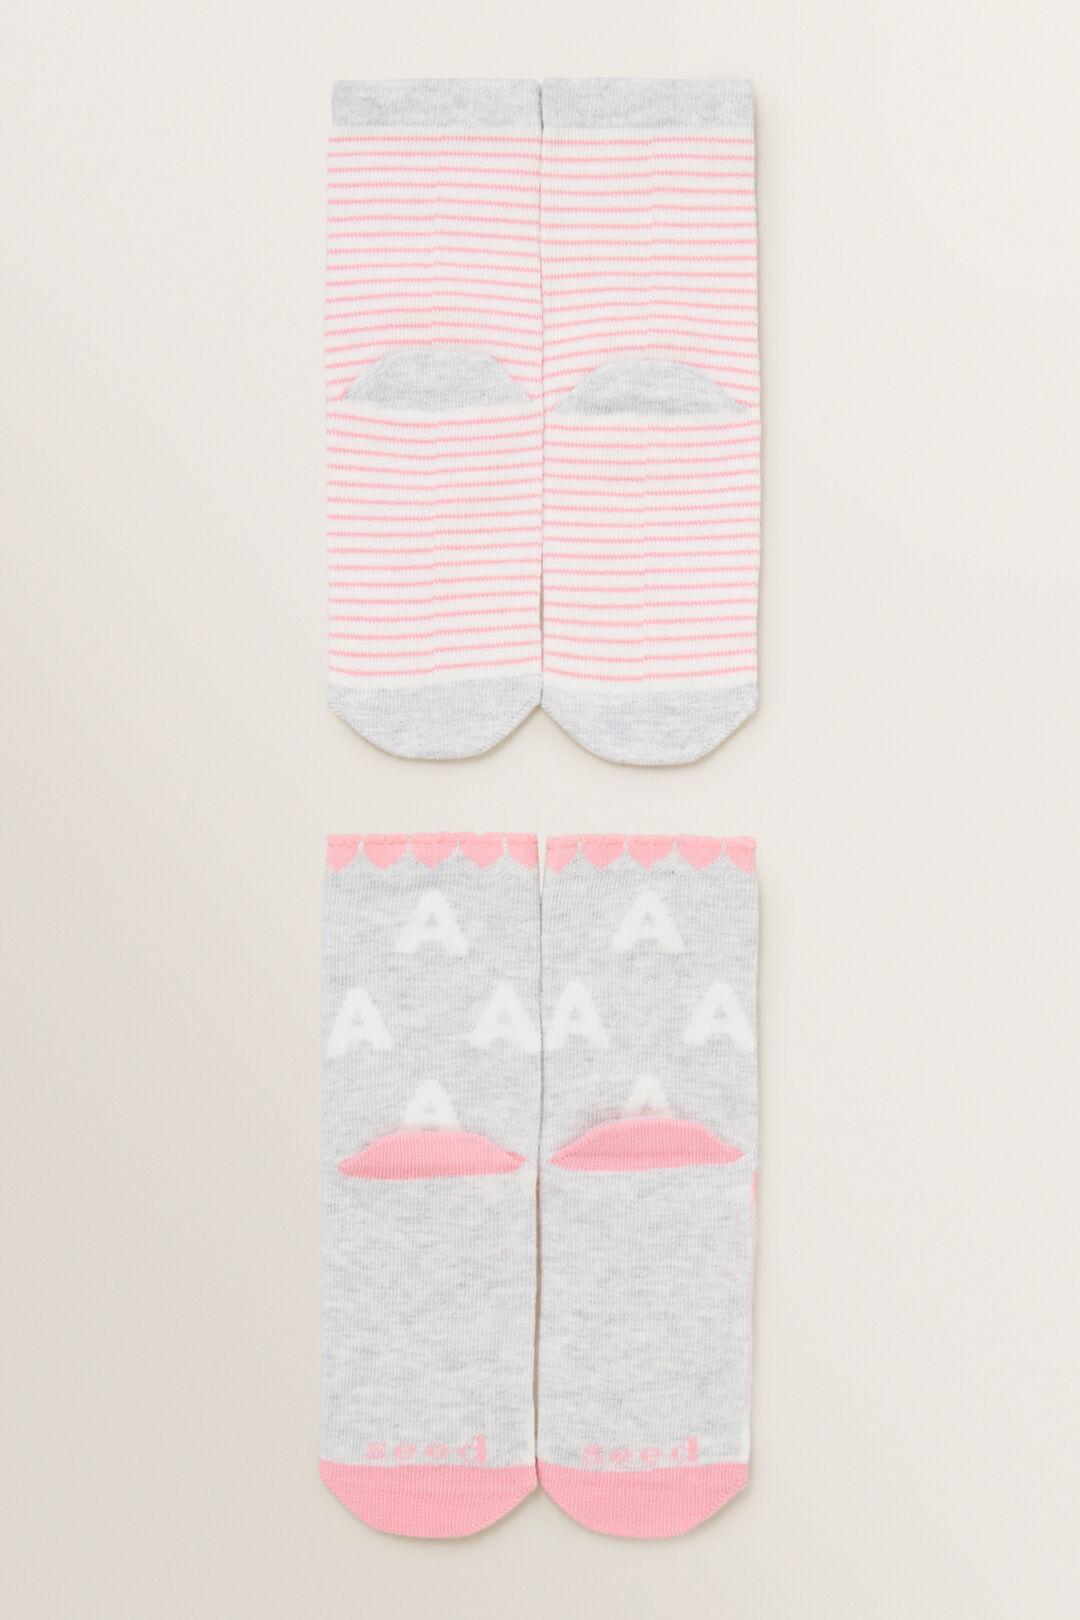 Unicorn Initial Sock 2 Pack  A  hi-res